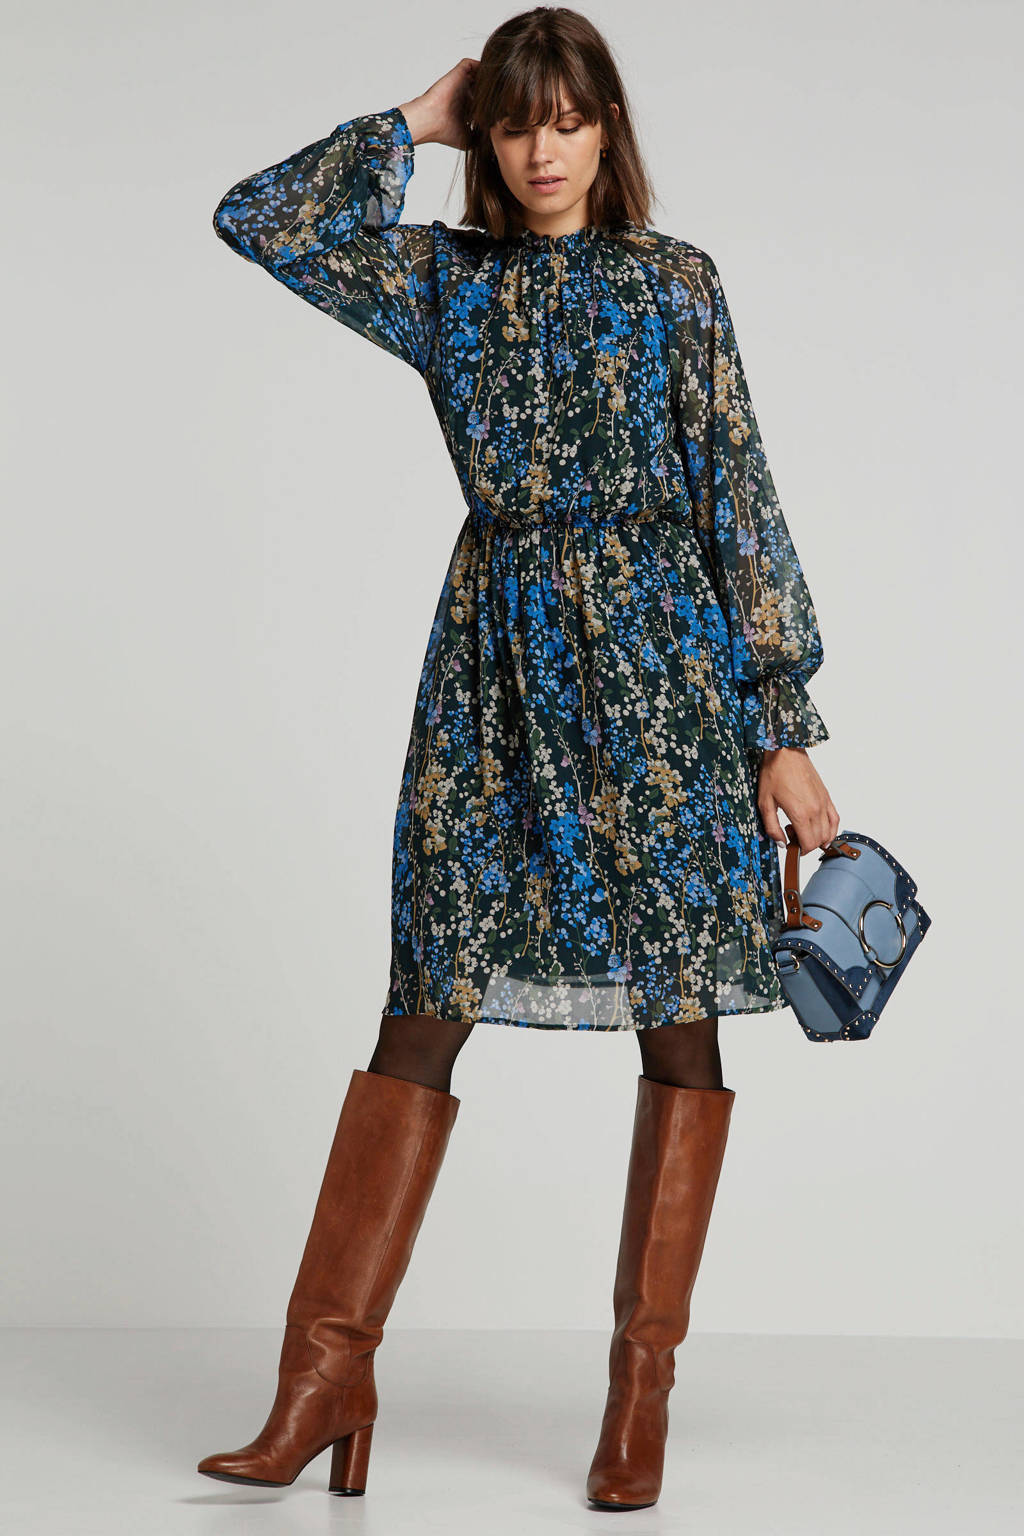 Wehkamp x NA-KD gebloemde semi-transparante blousejurk zwart/donkerblauw/bruin, Zwart/donkerblauw/bruin